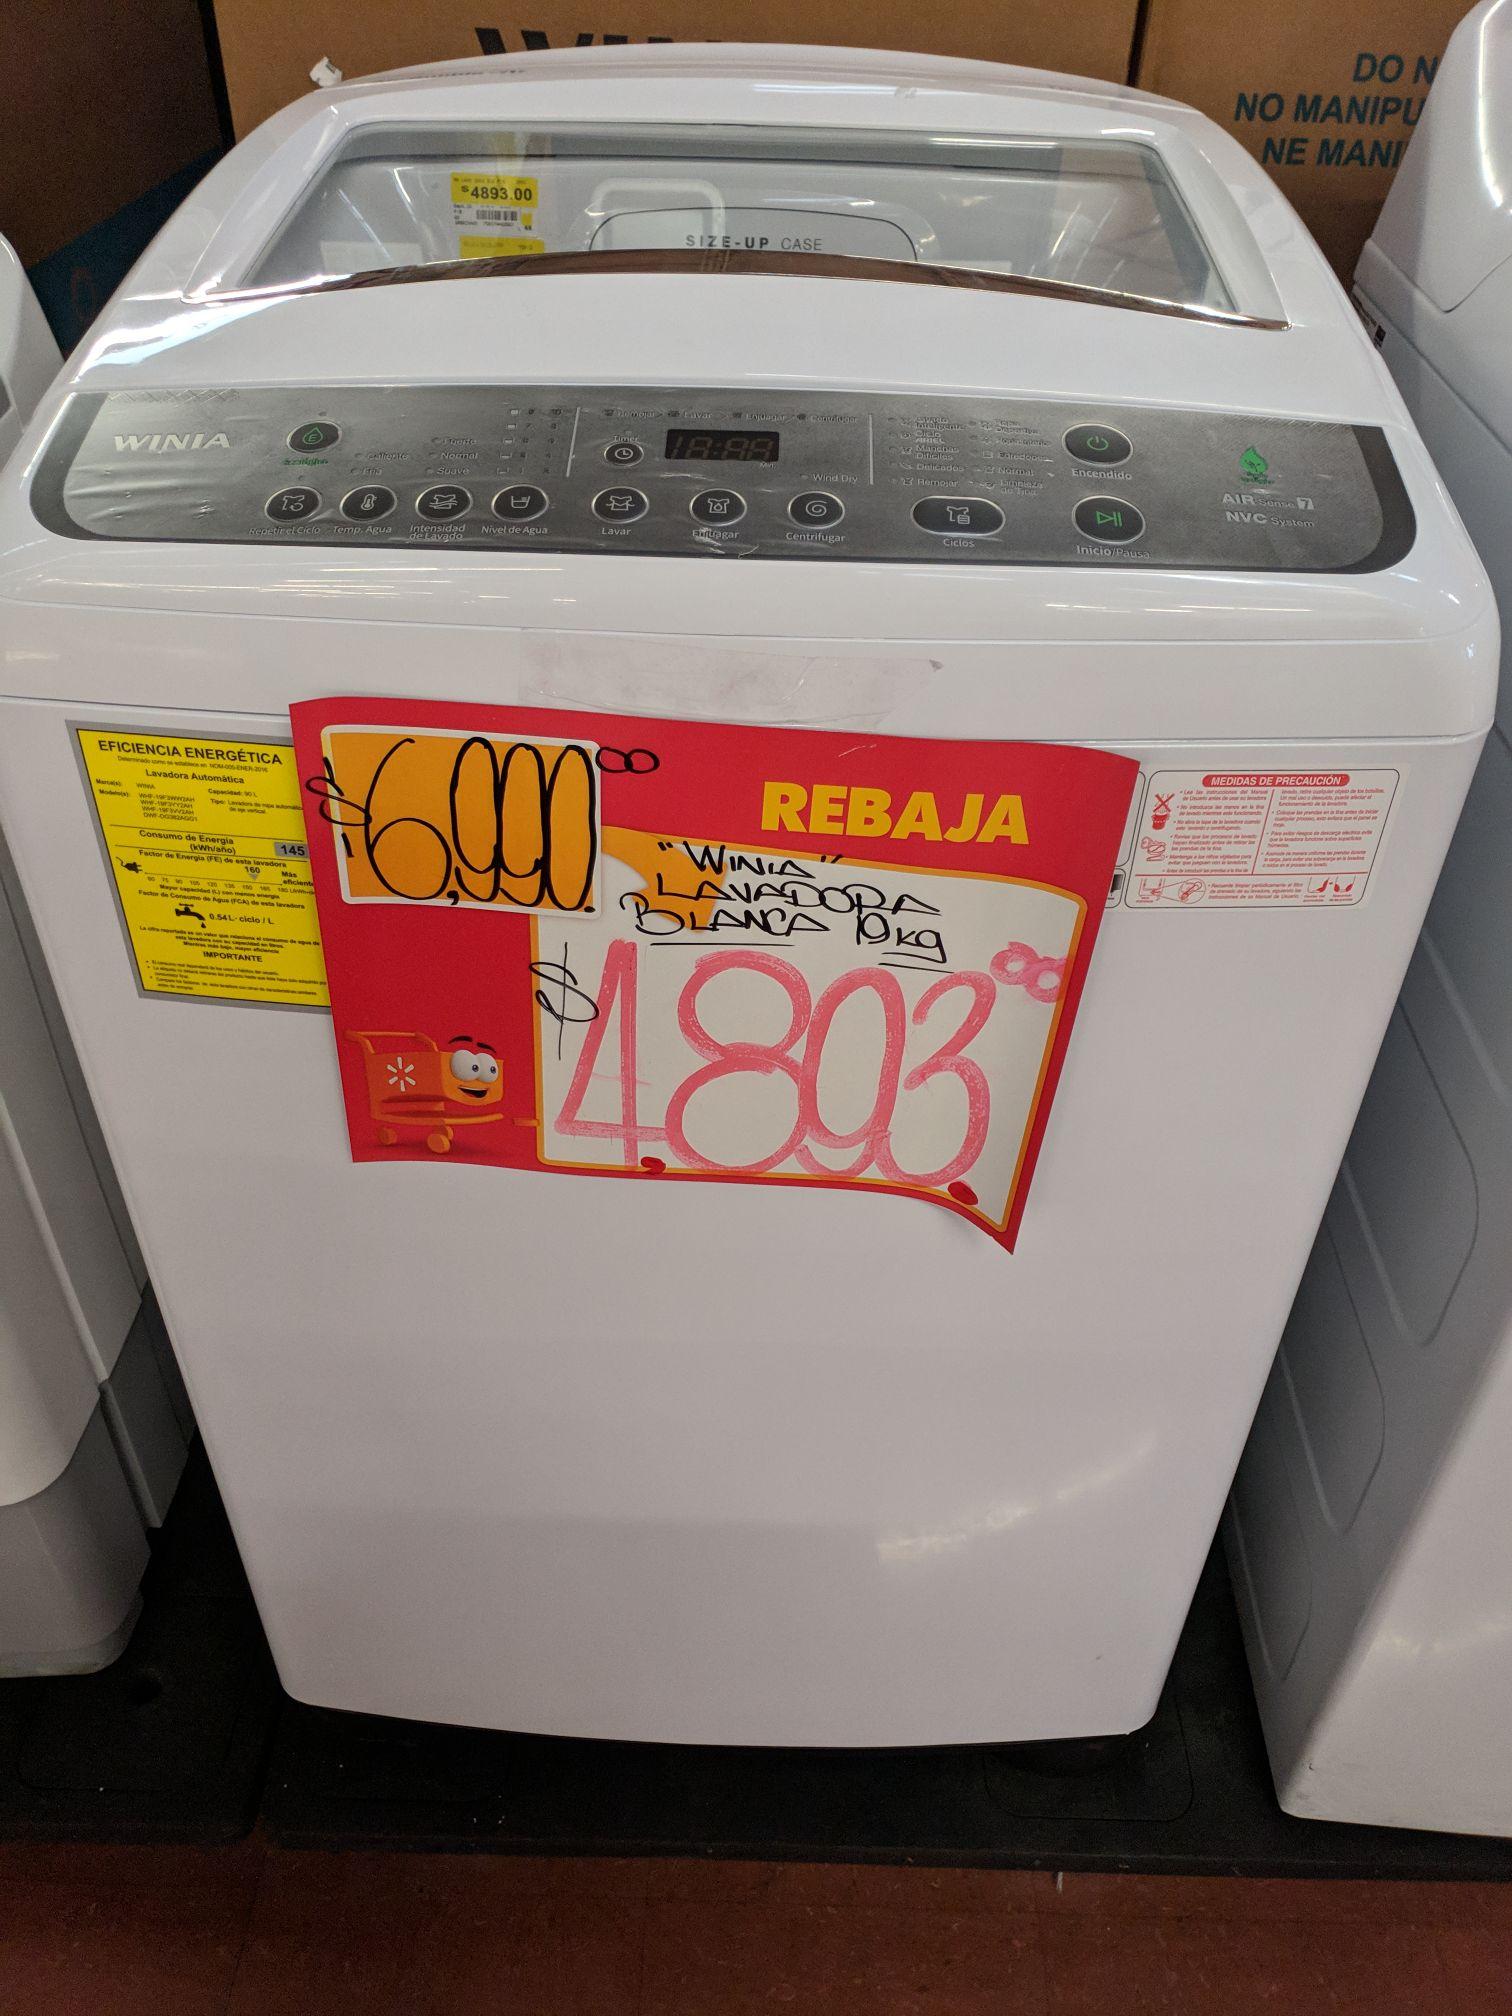 Walmart: Lavadora Winia (antes Daewoo) 19kG